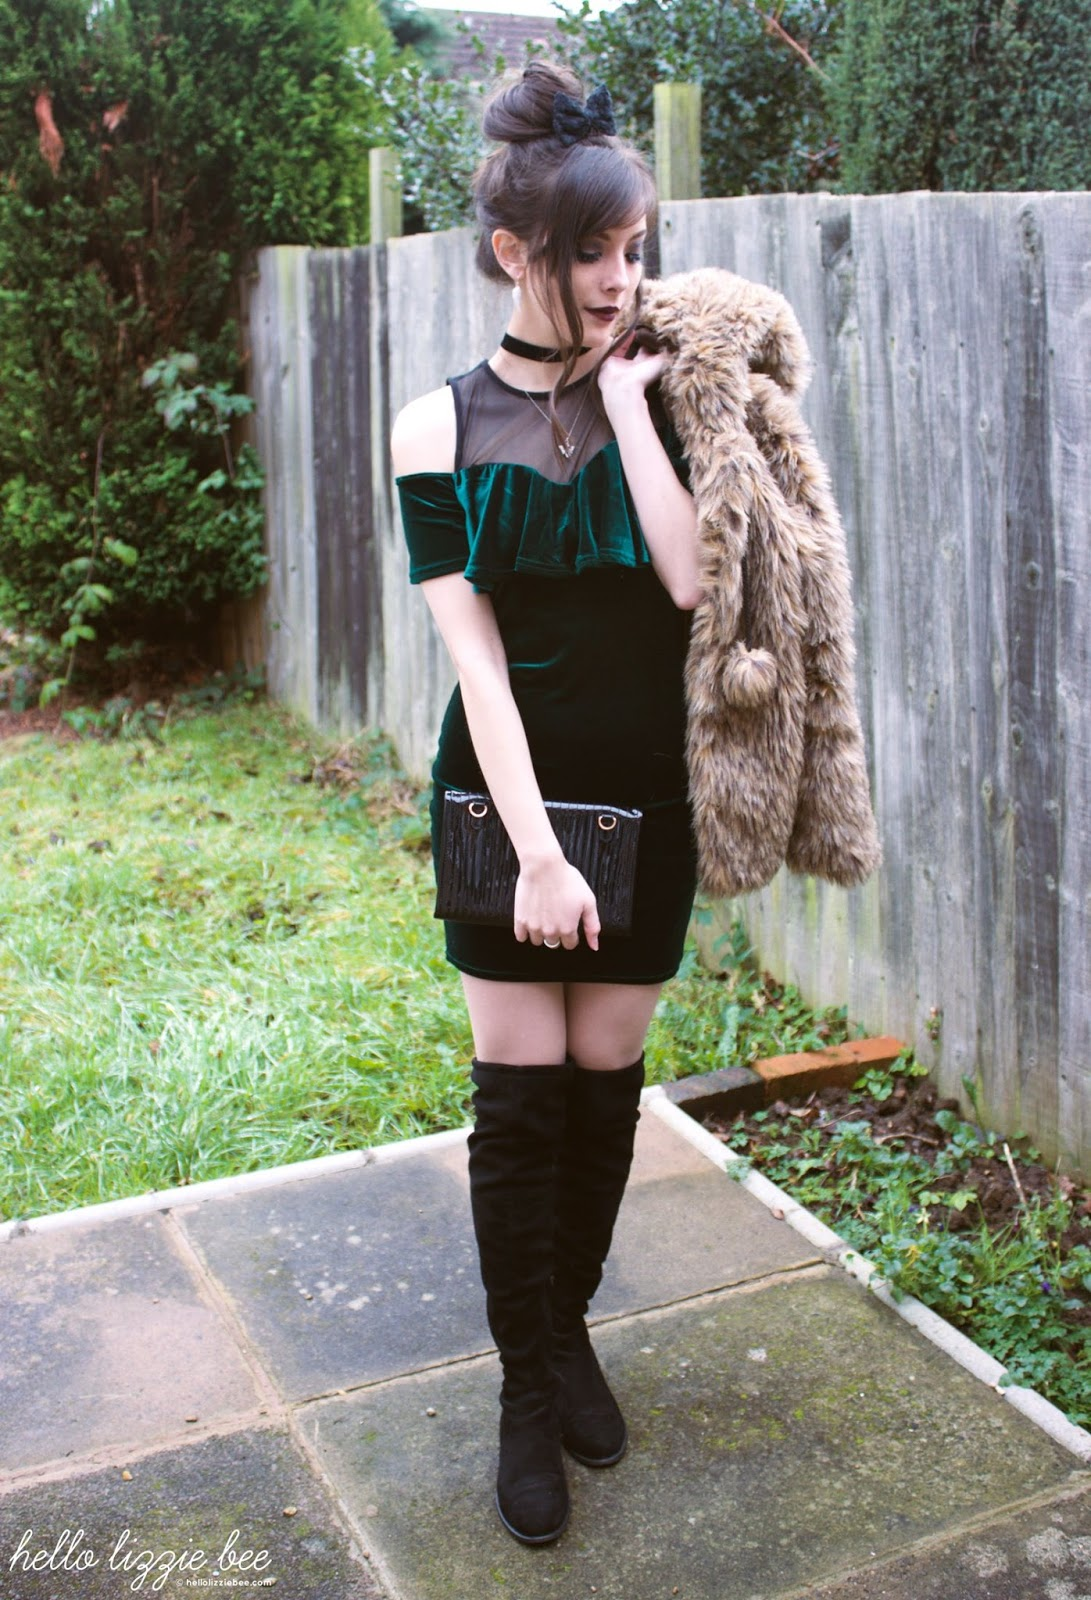 rokku gyaru outfit